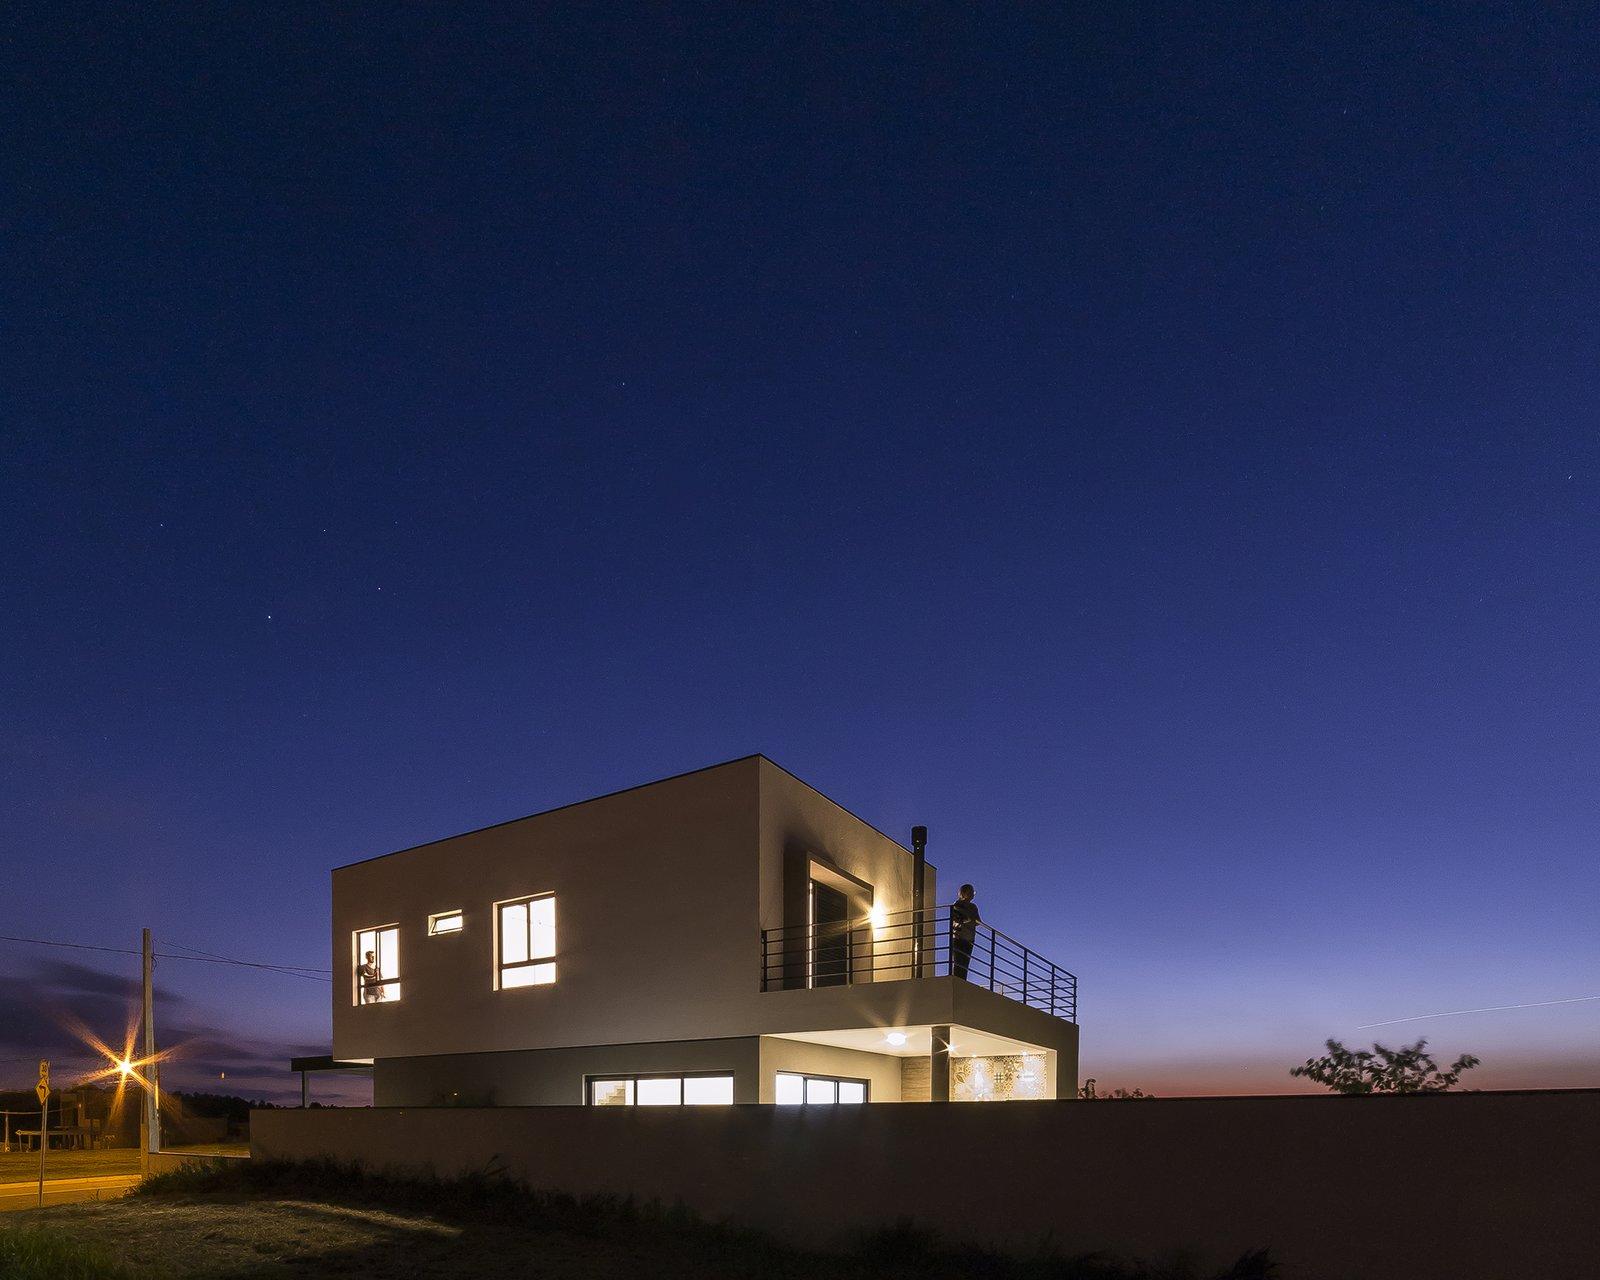 lighting  SG House by Taguá Arquitetura+Design